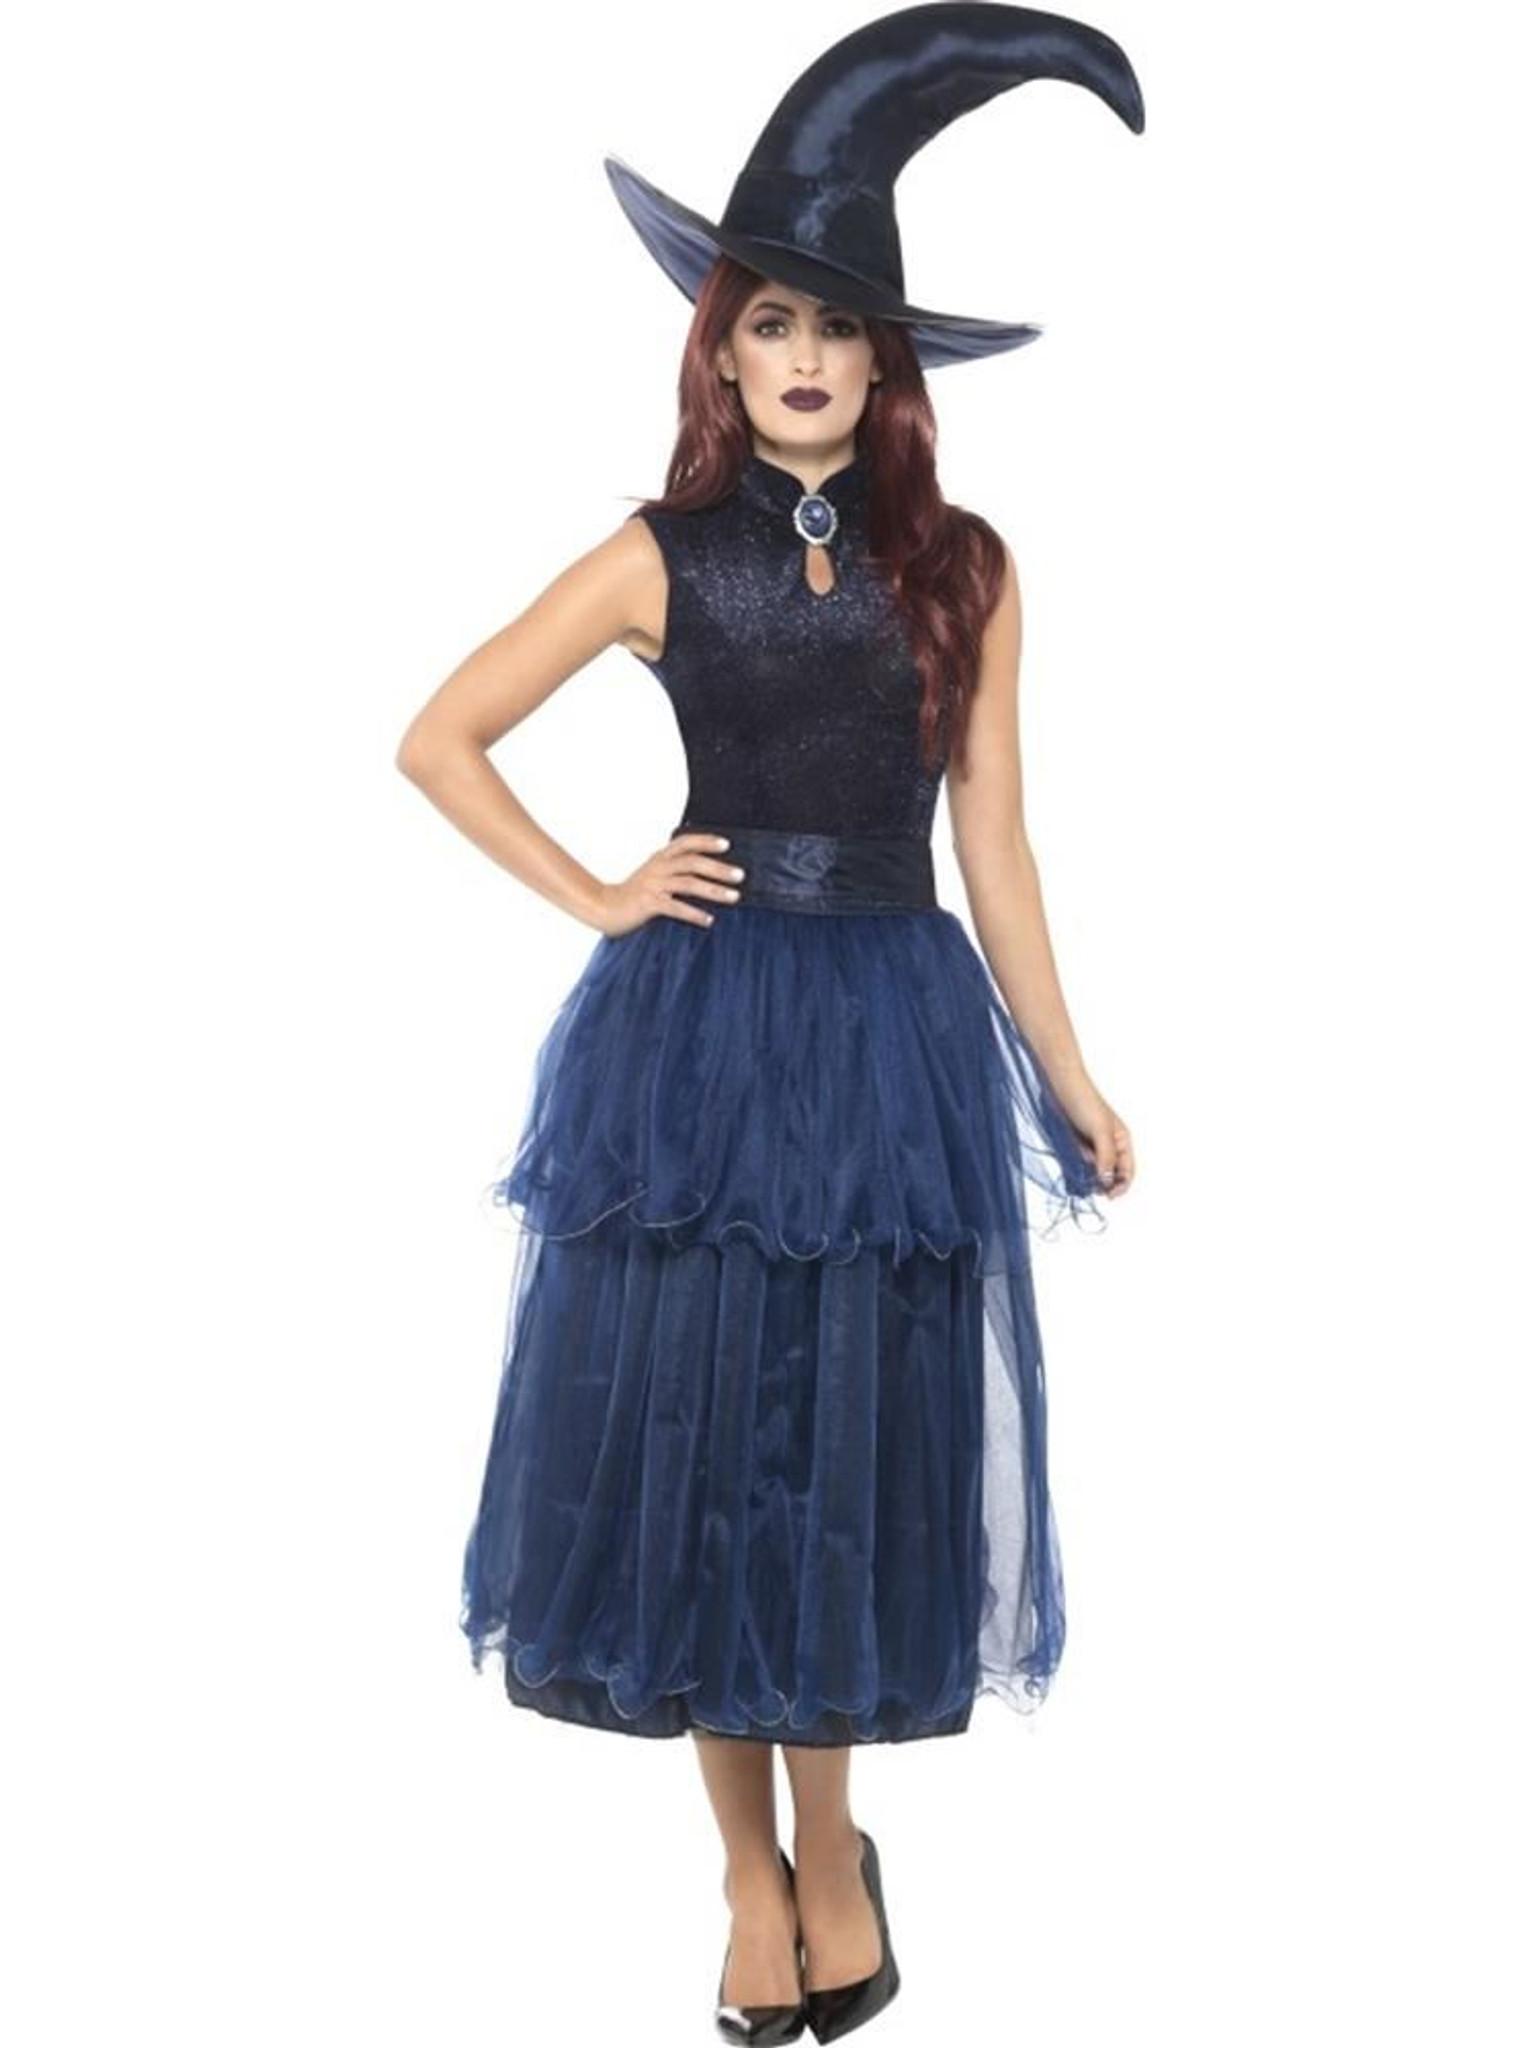 Costume Halloween Uk.Deluxe Midnight Witch Costume Halloween Adult Fancy Dress Uk Size 8 10